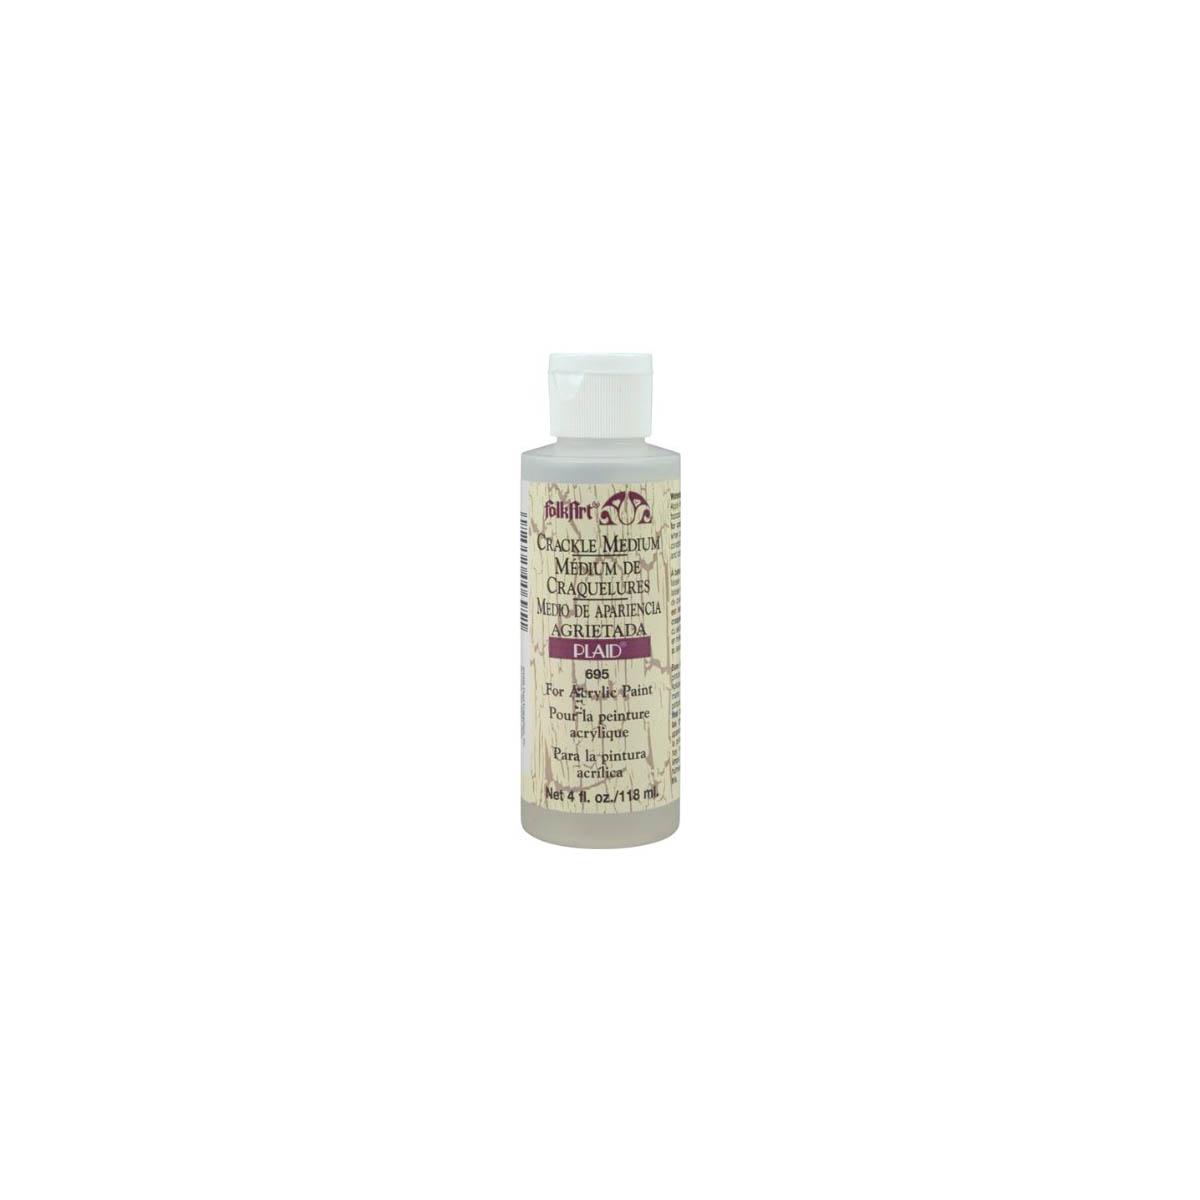 FolkArt ® Mediums - Crackle Medium, 4 oz. - 695